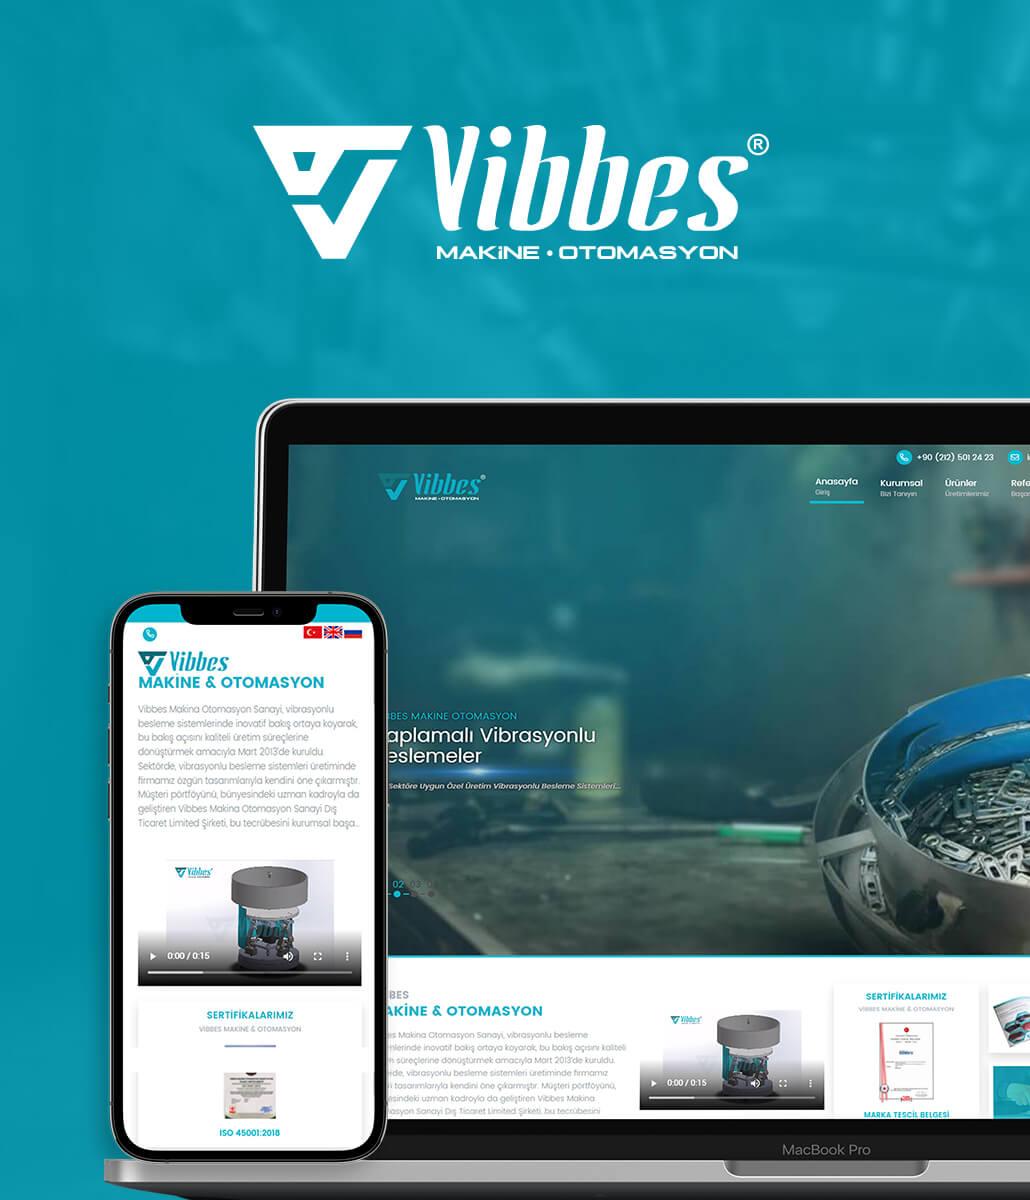 Vibbes Makina Kurumsal Web Tasarım